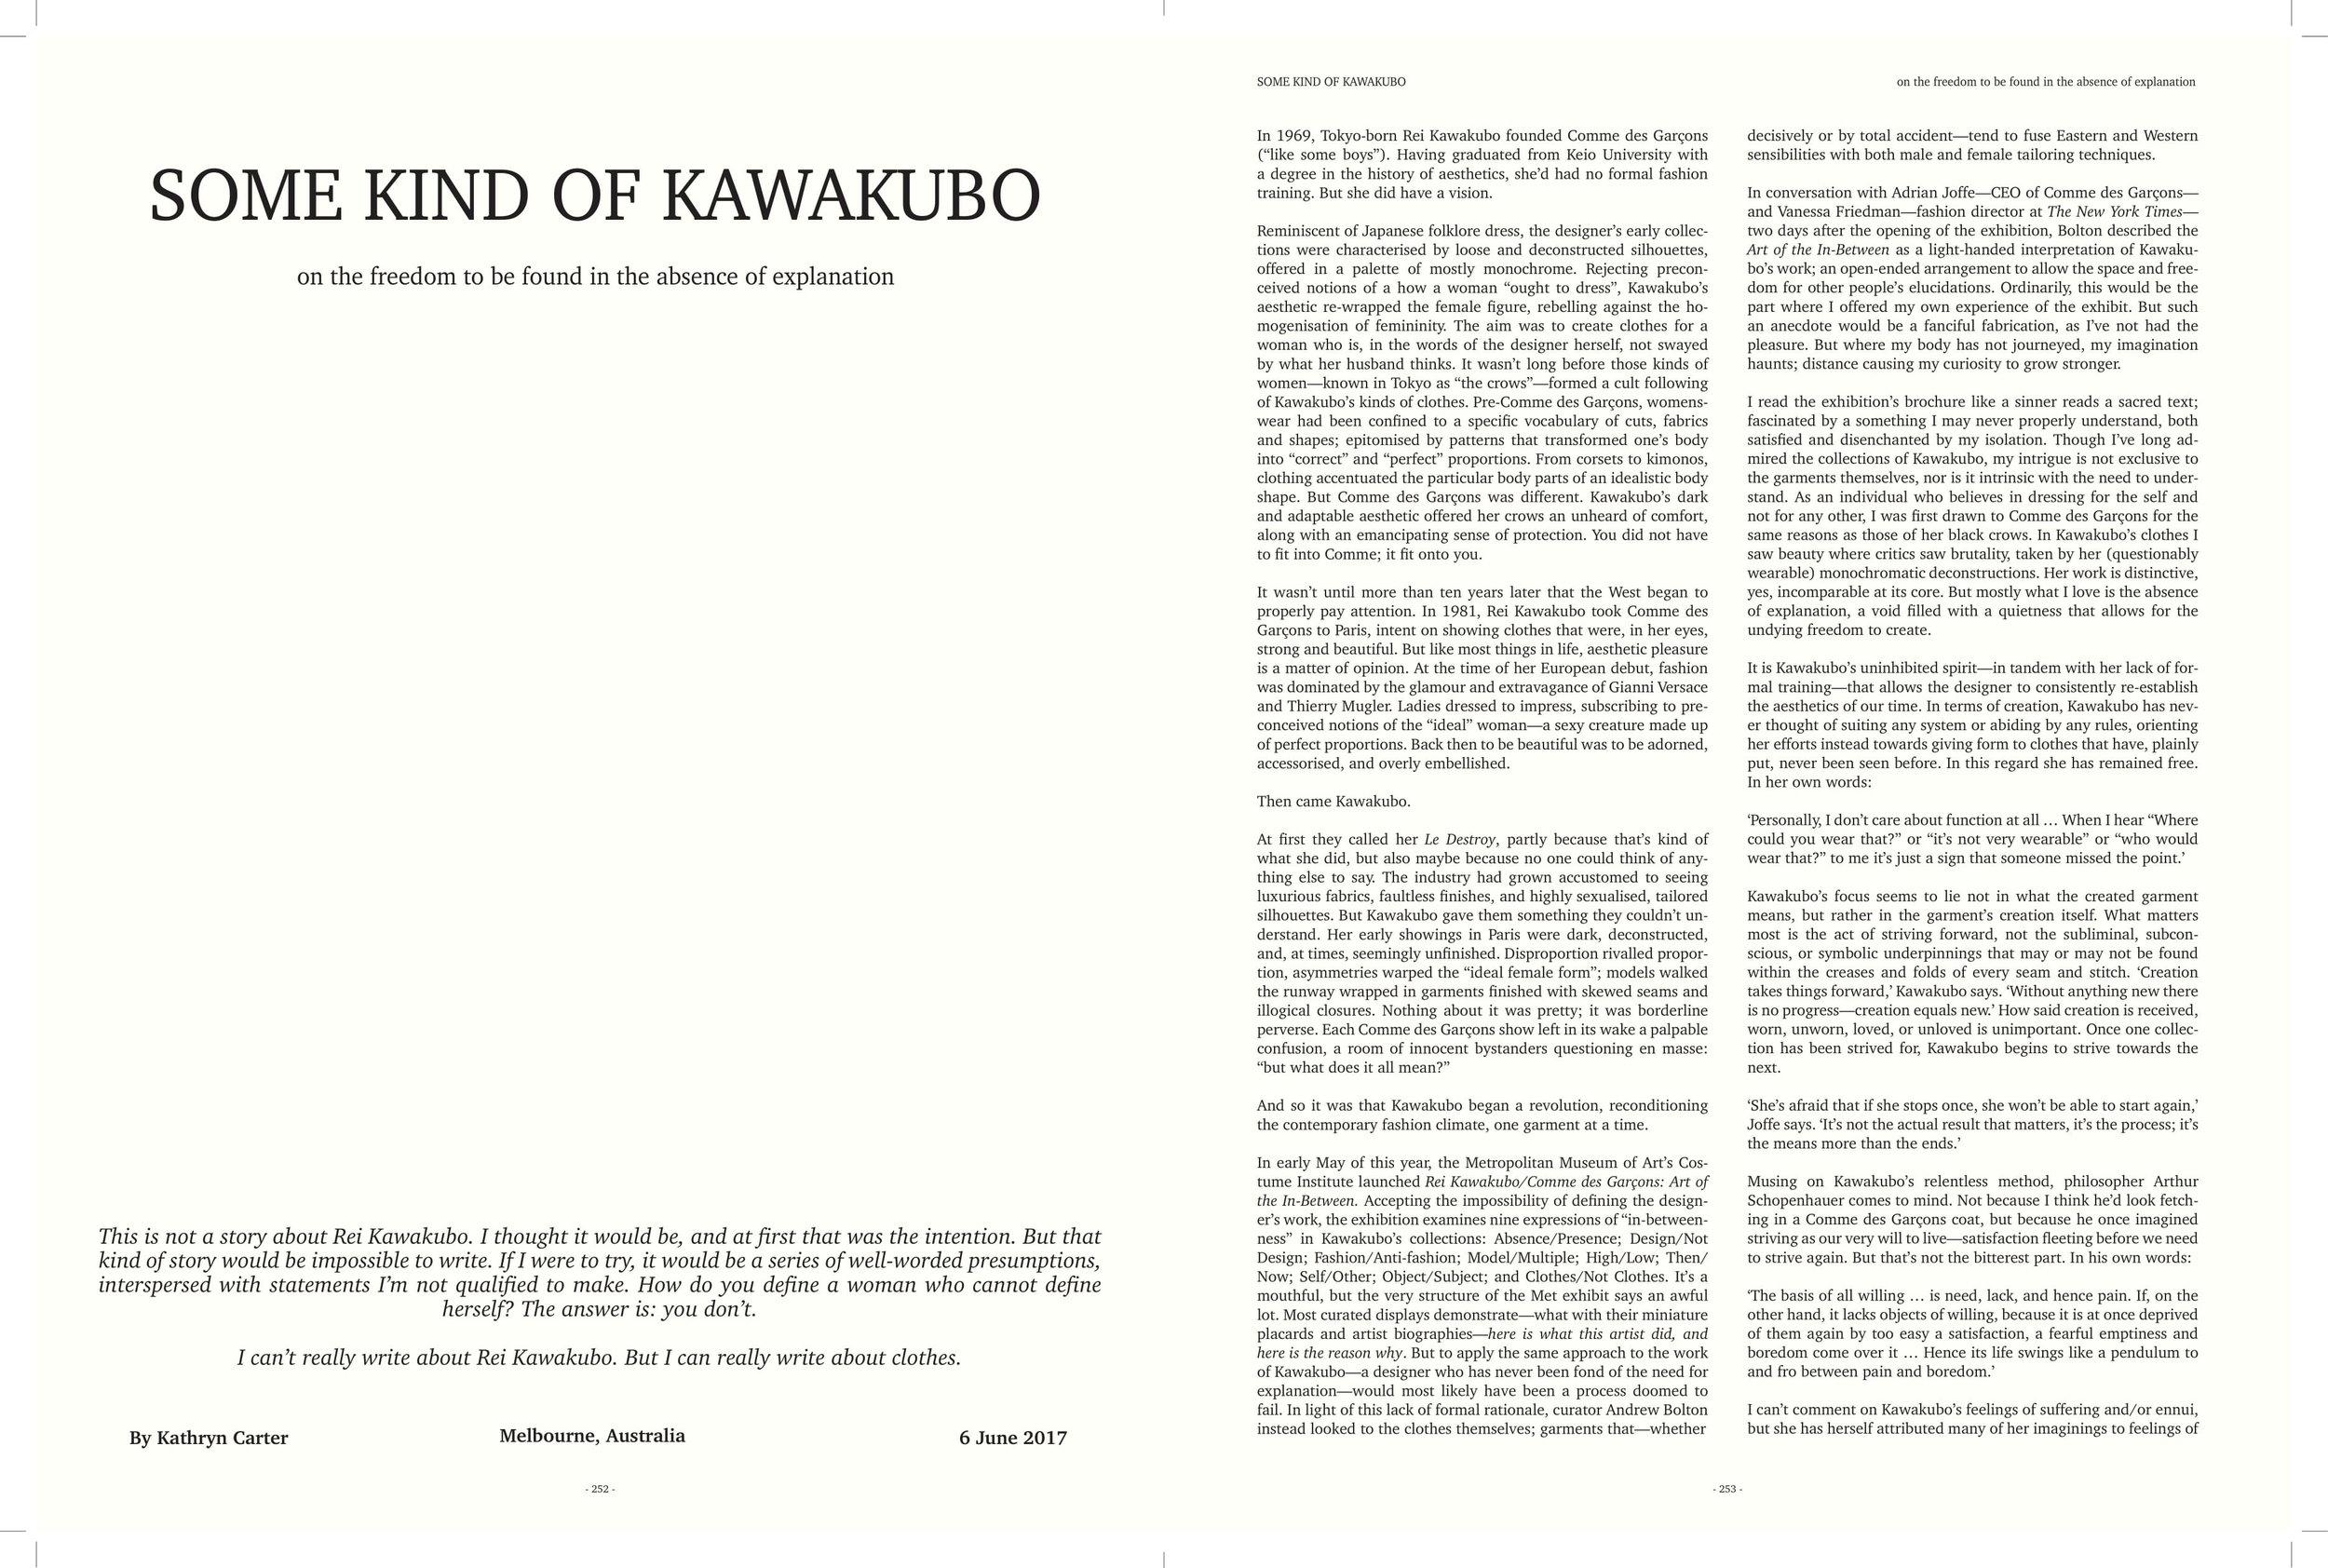 Some kind of Kawakubo-1.jpg